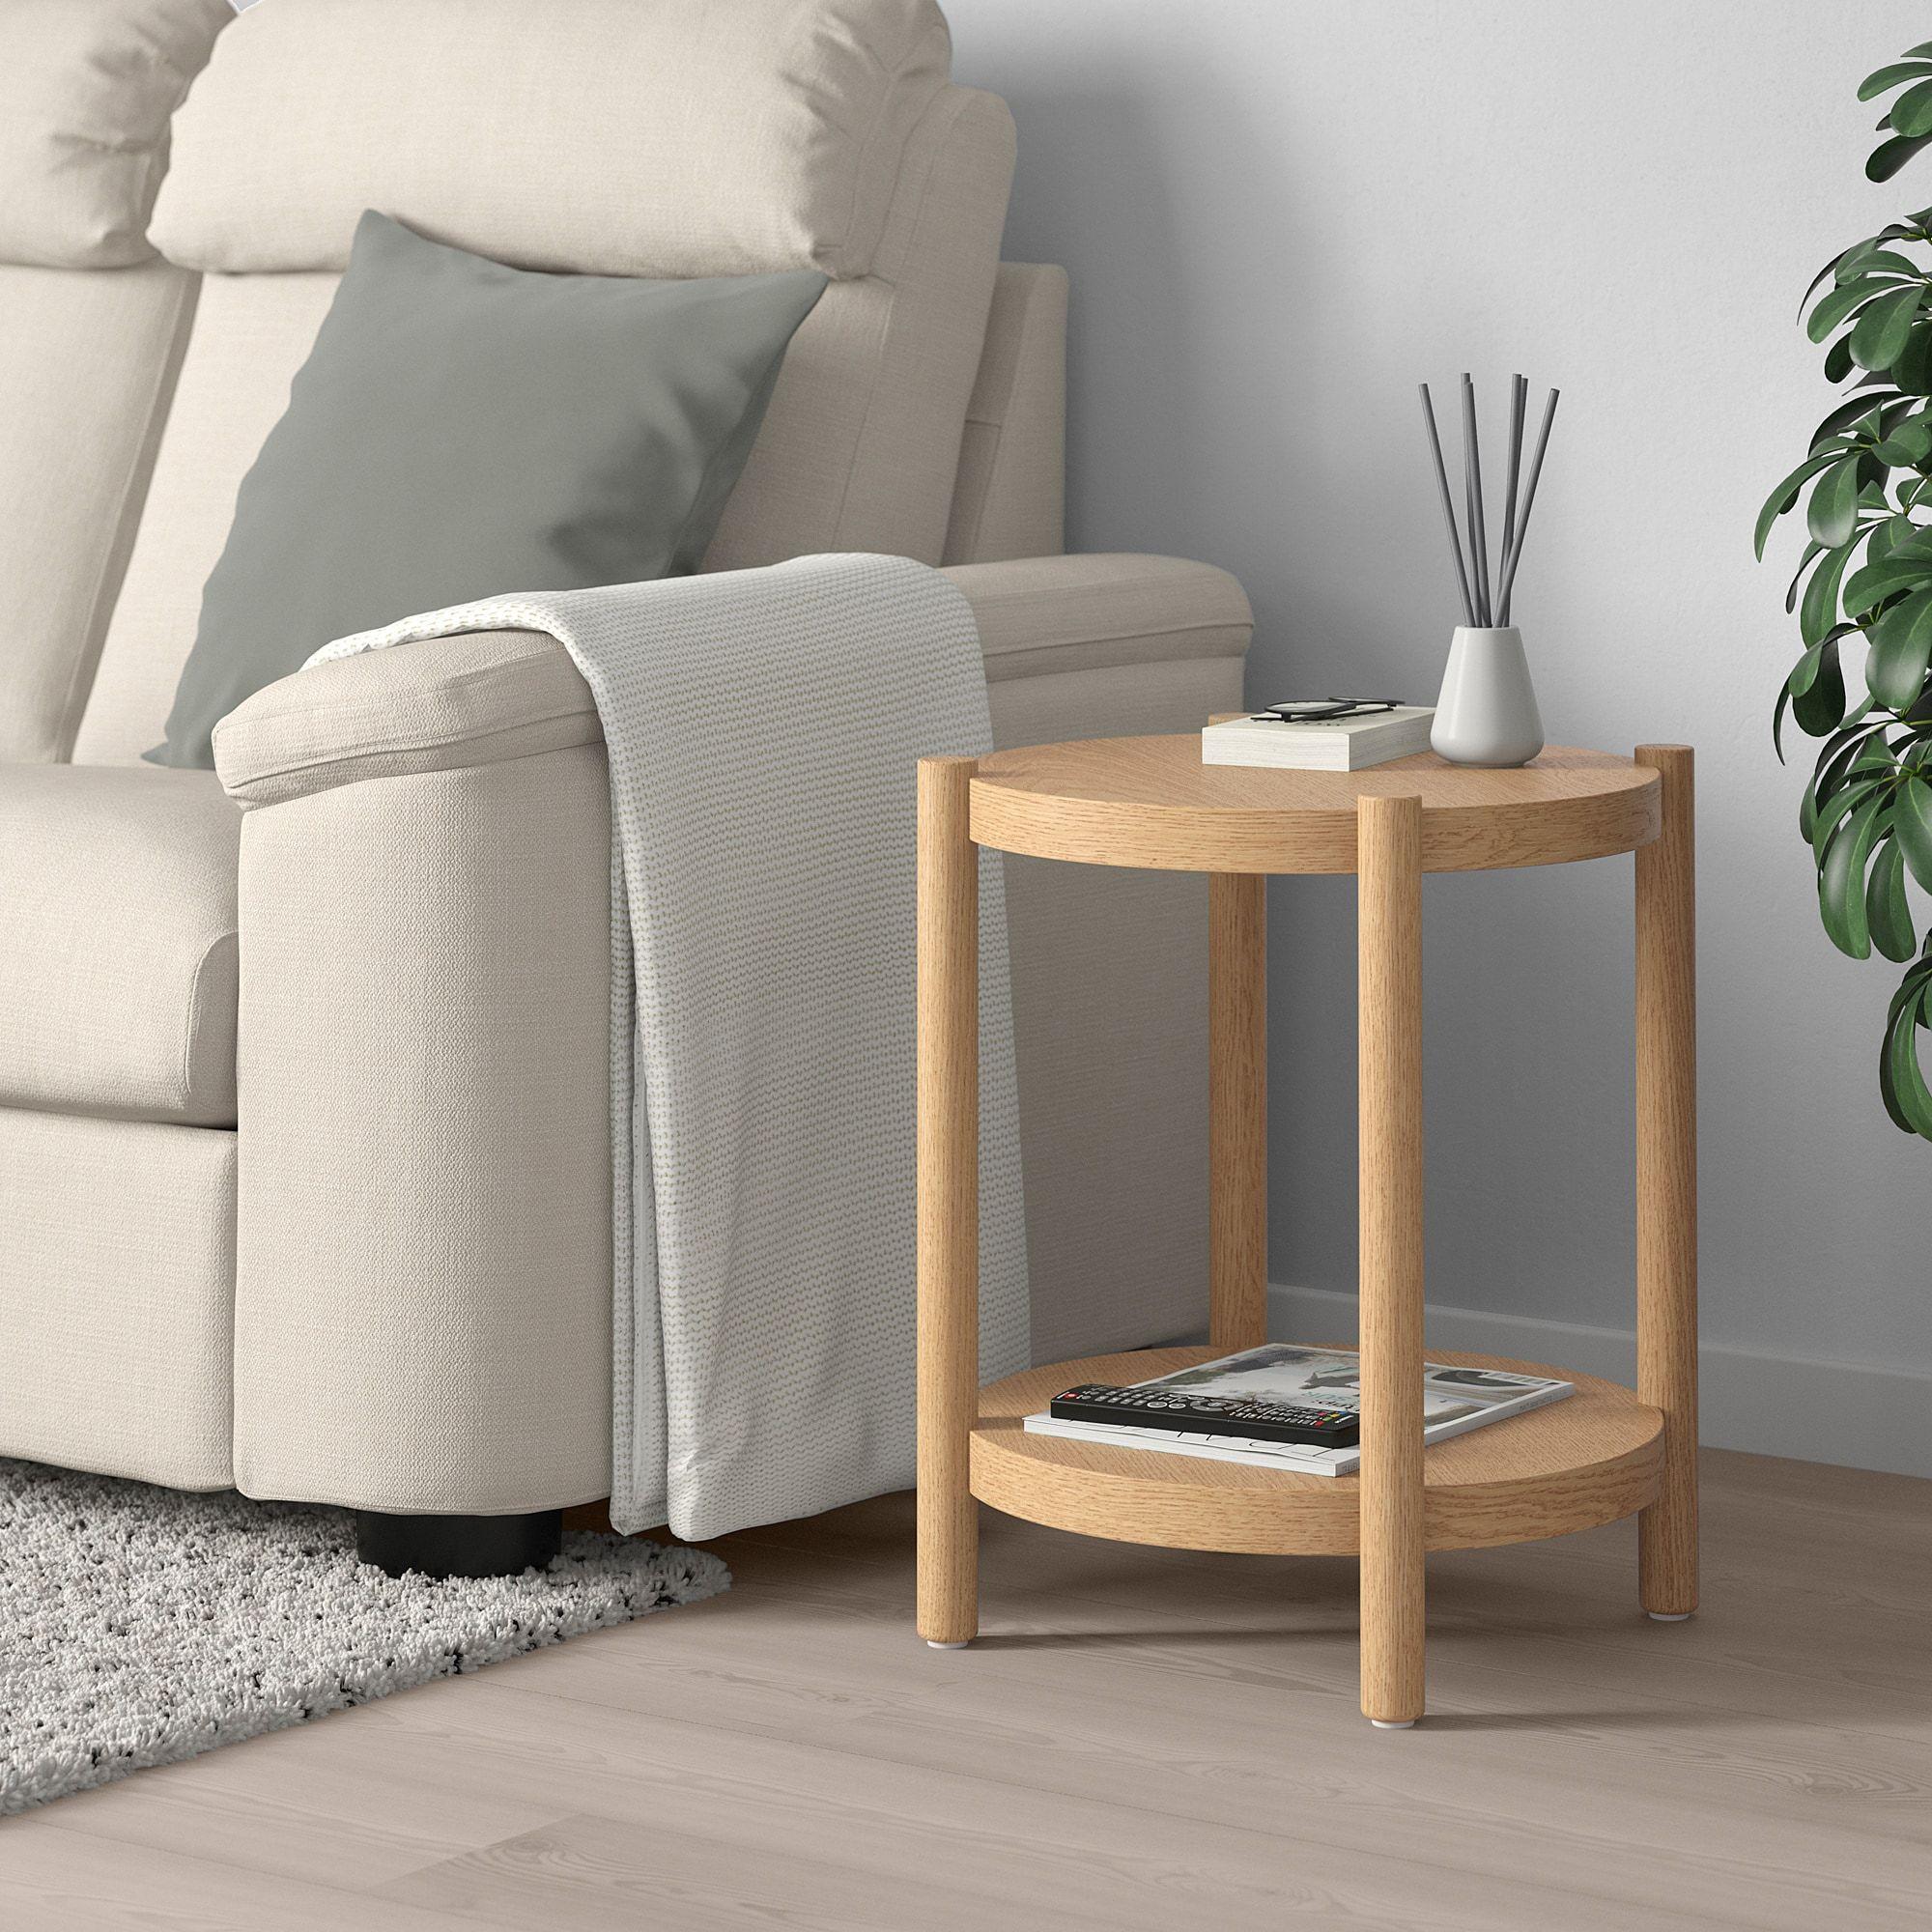 Listerby Dohanyzoasztal Feher Pacolt Tolgy 50 Cm Ikea Oak Side Table White Side Tables Ikea Side Table [ 2000 x 2000 Pixel ]